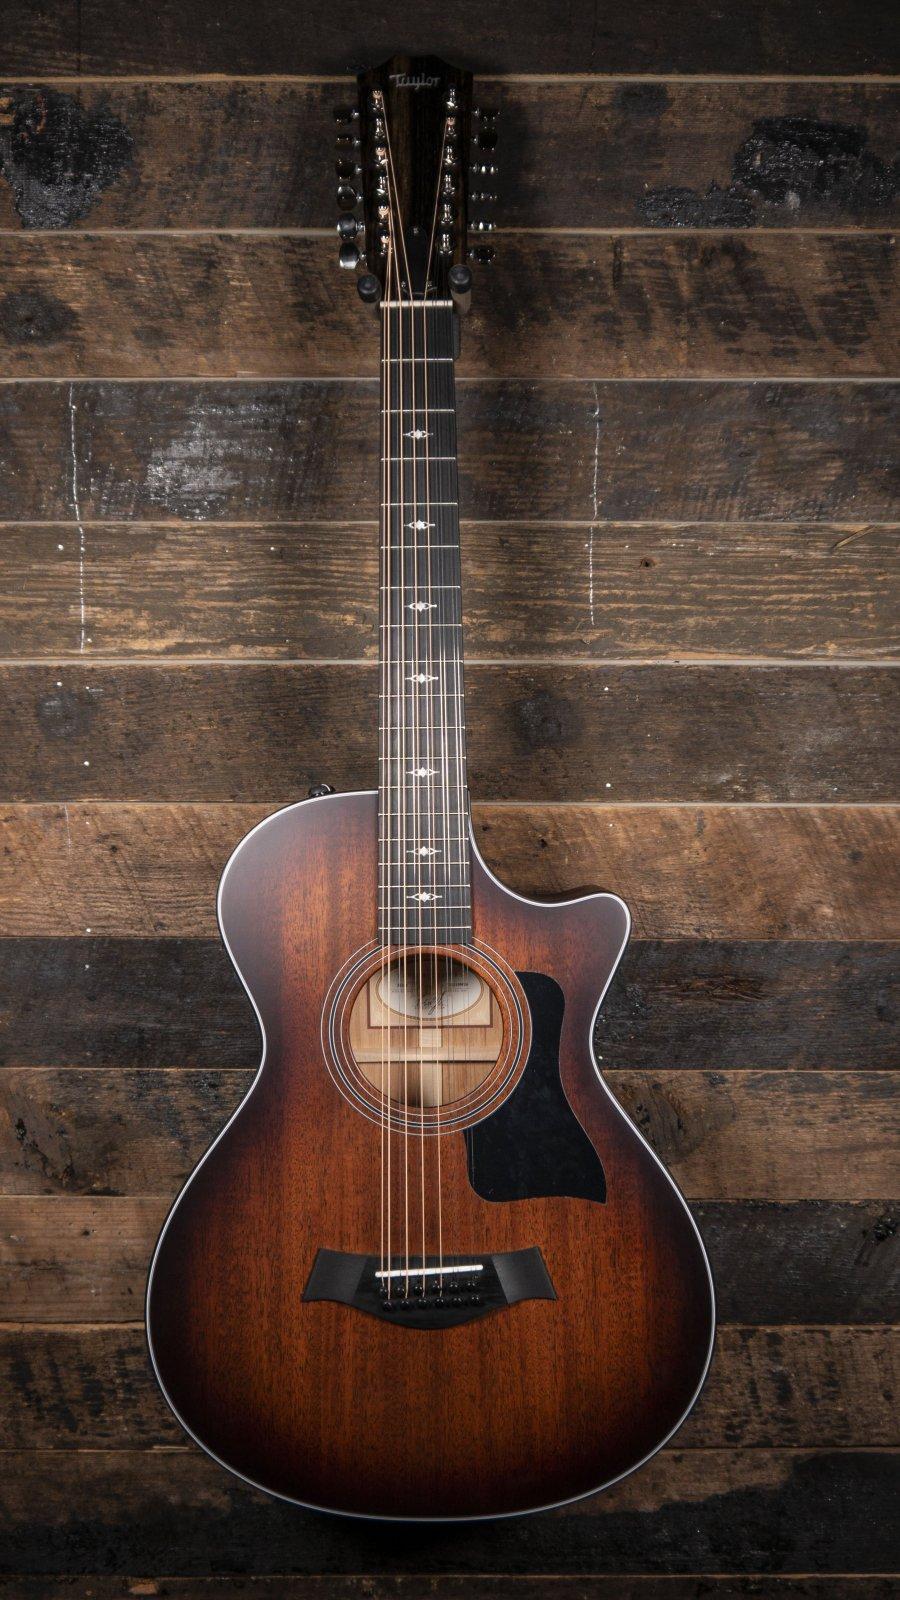 Taylor 362ce 12-fret 12 string